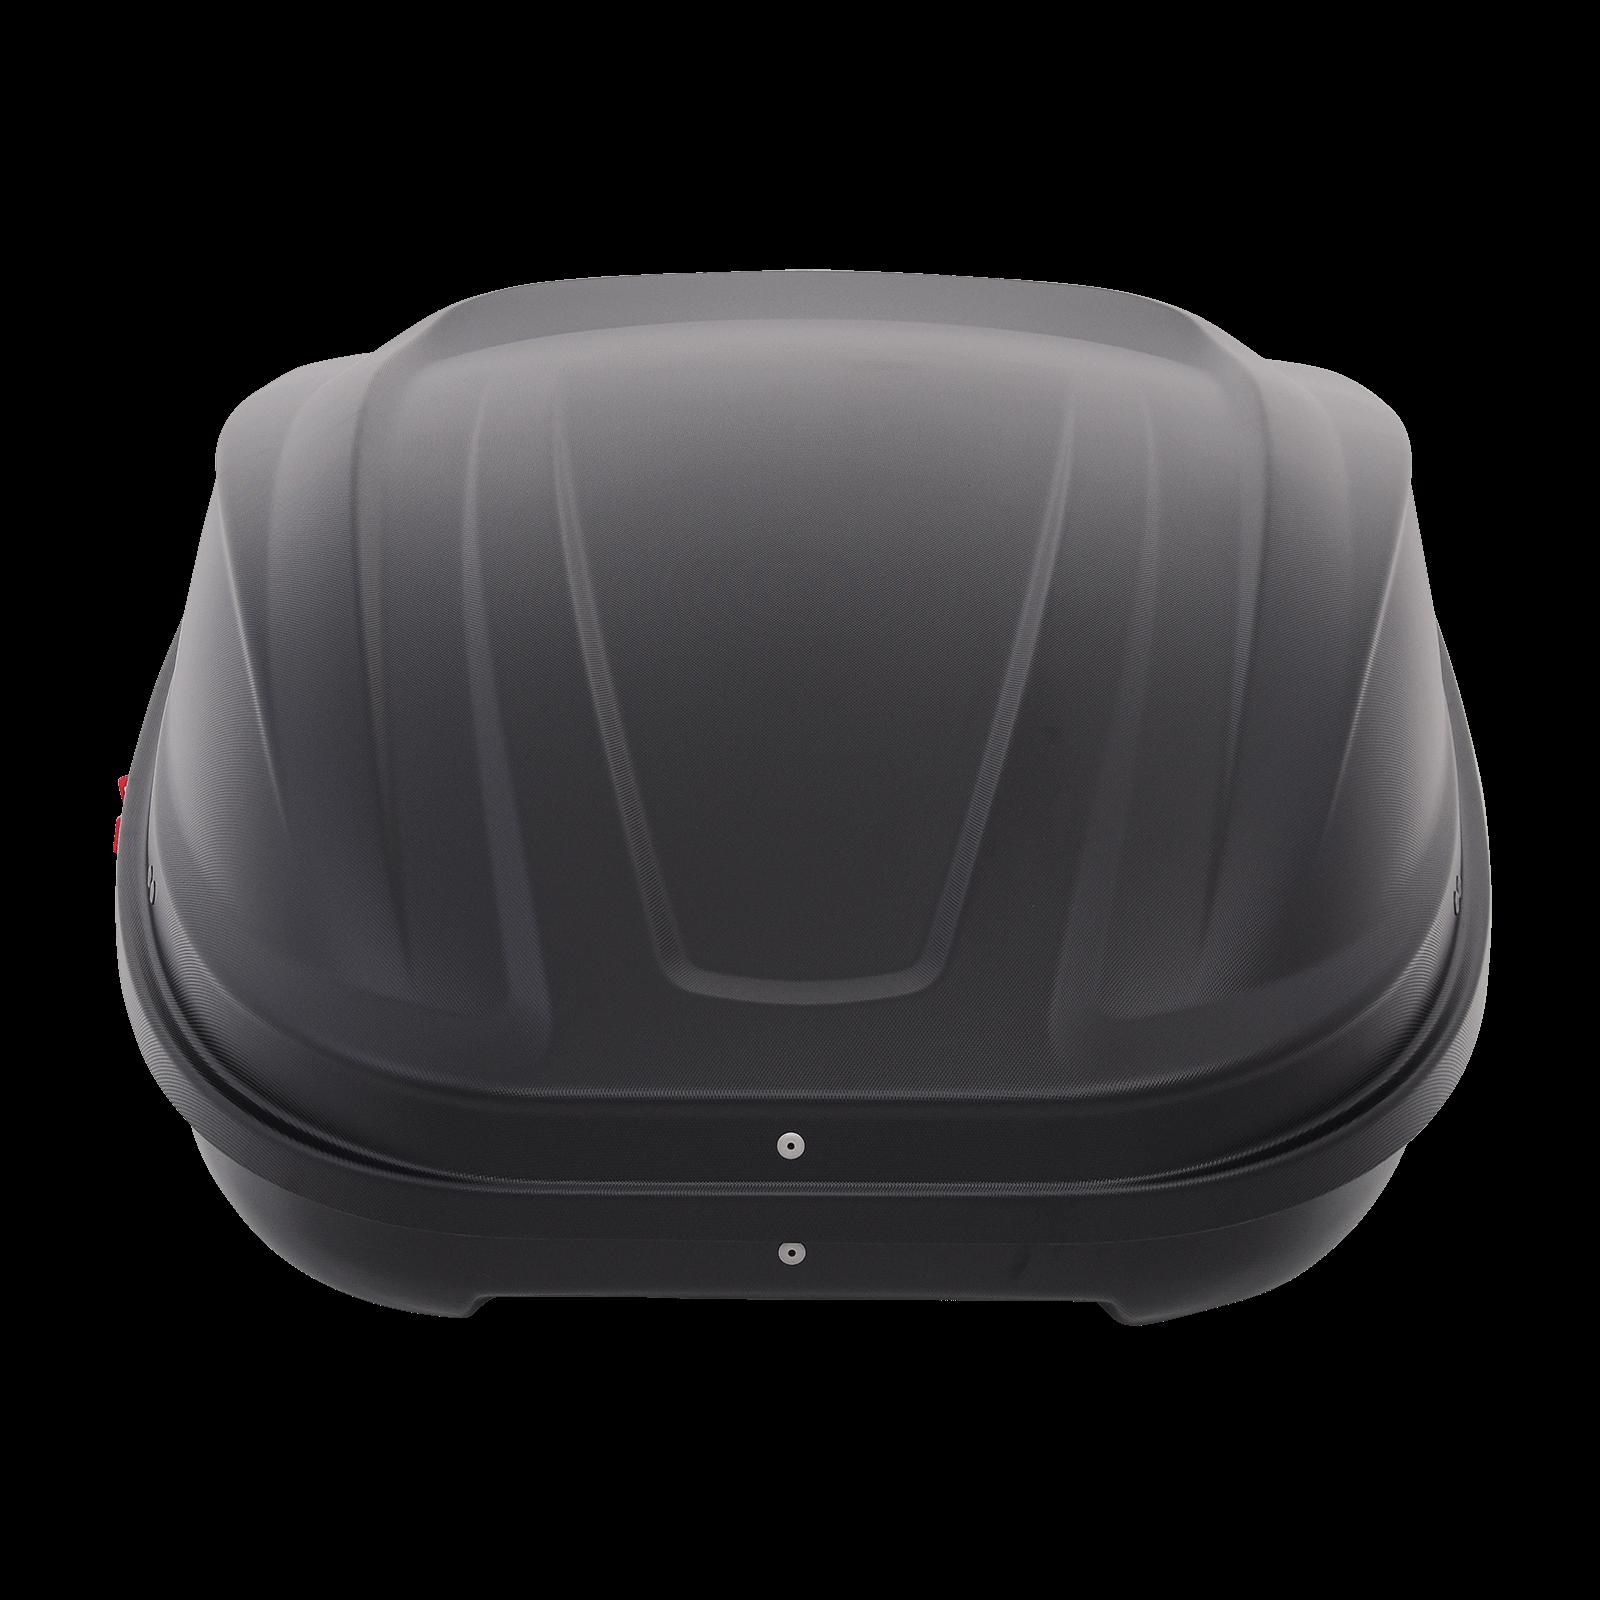 Dachbox G3 Spark 400 schwarz matt - Bild 3